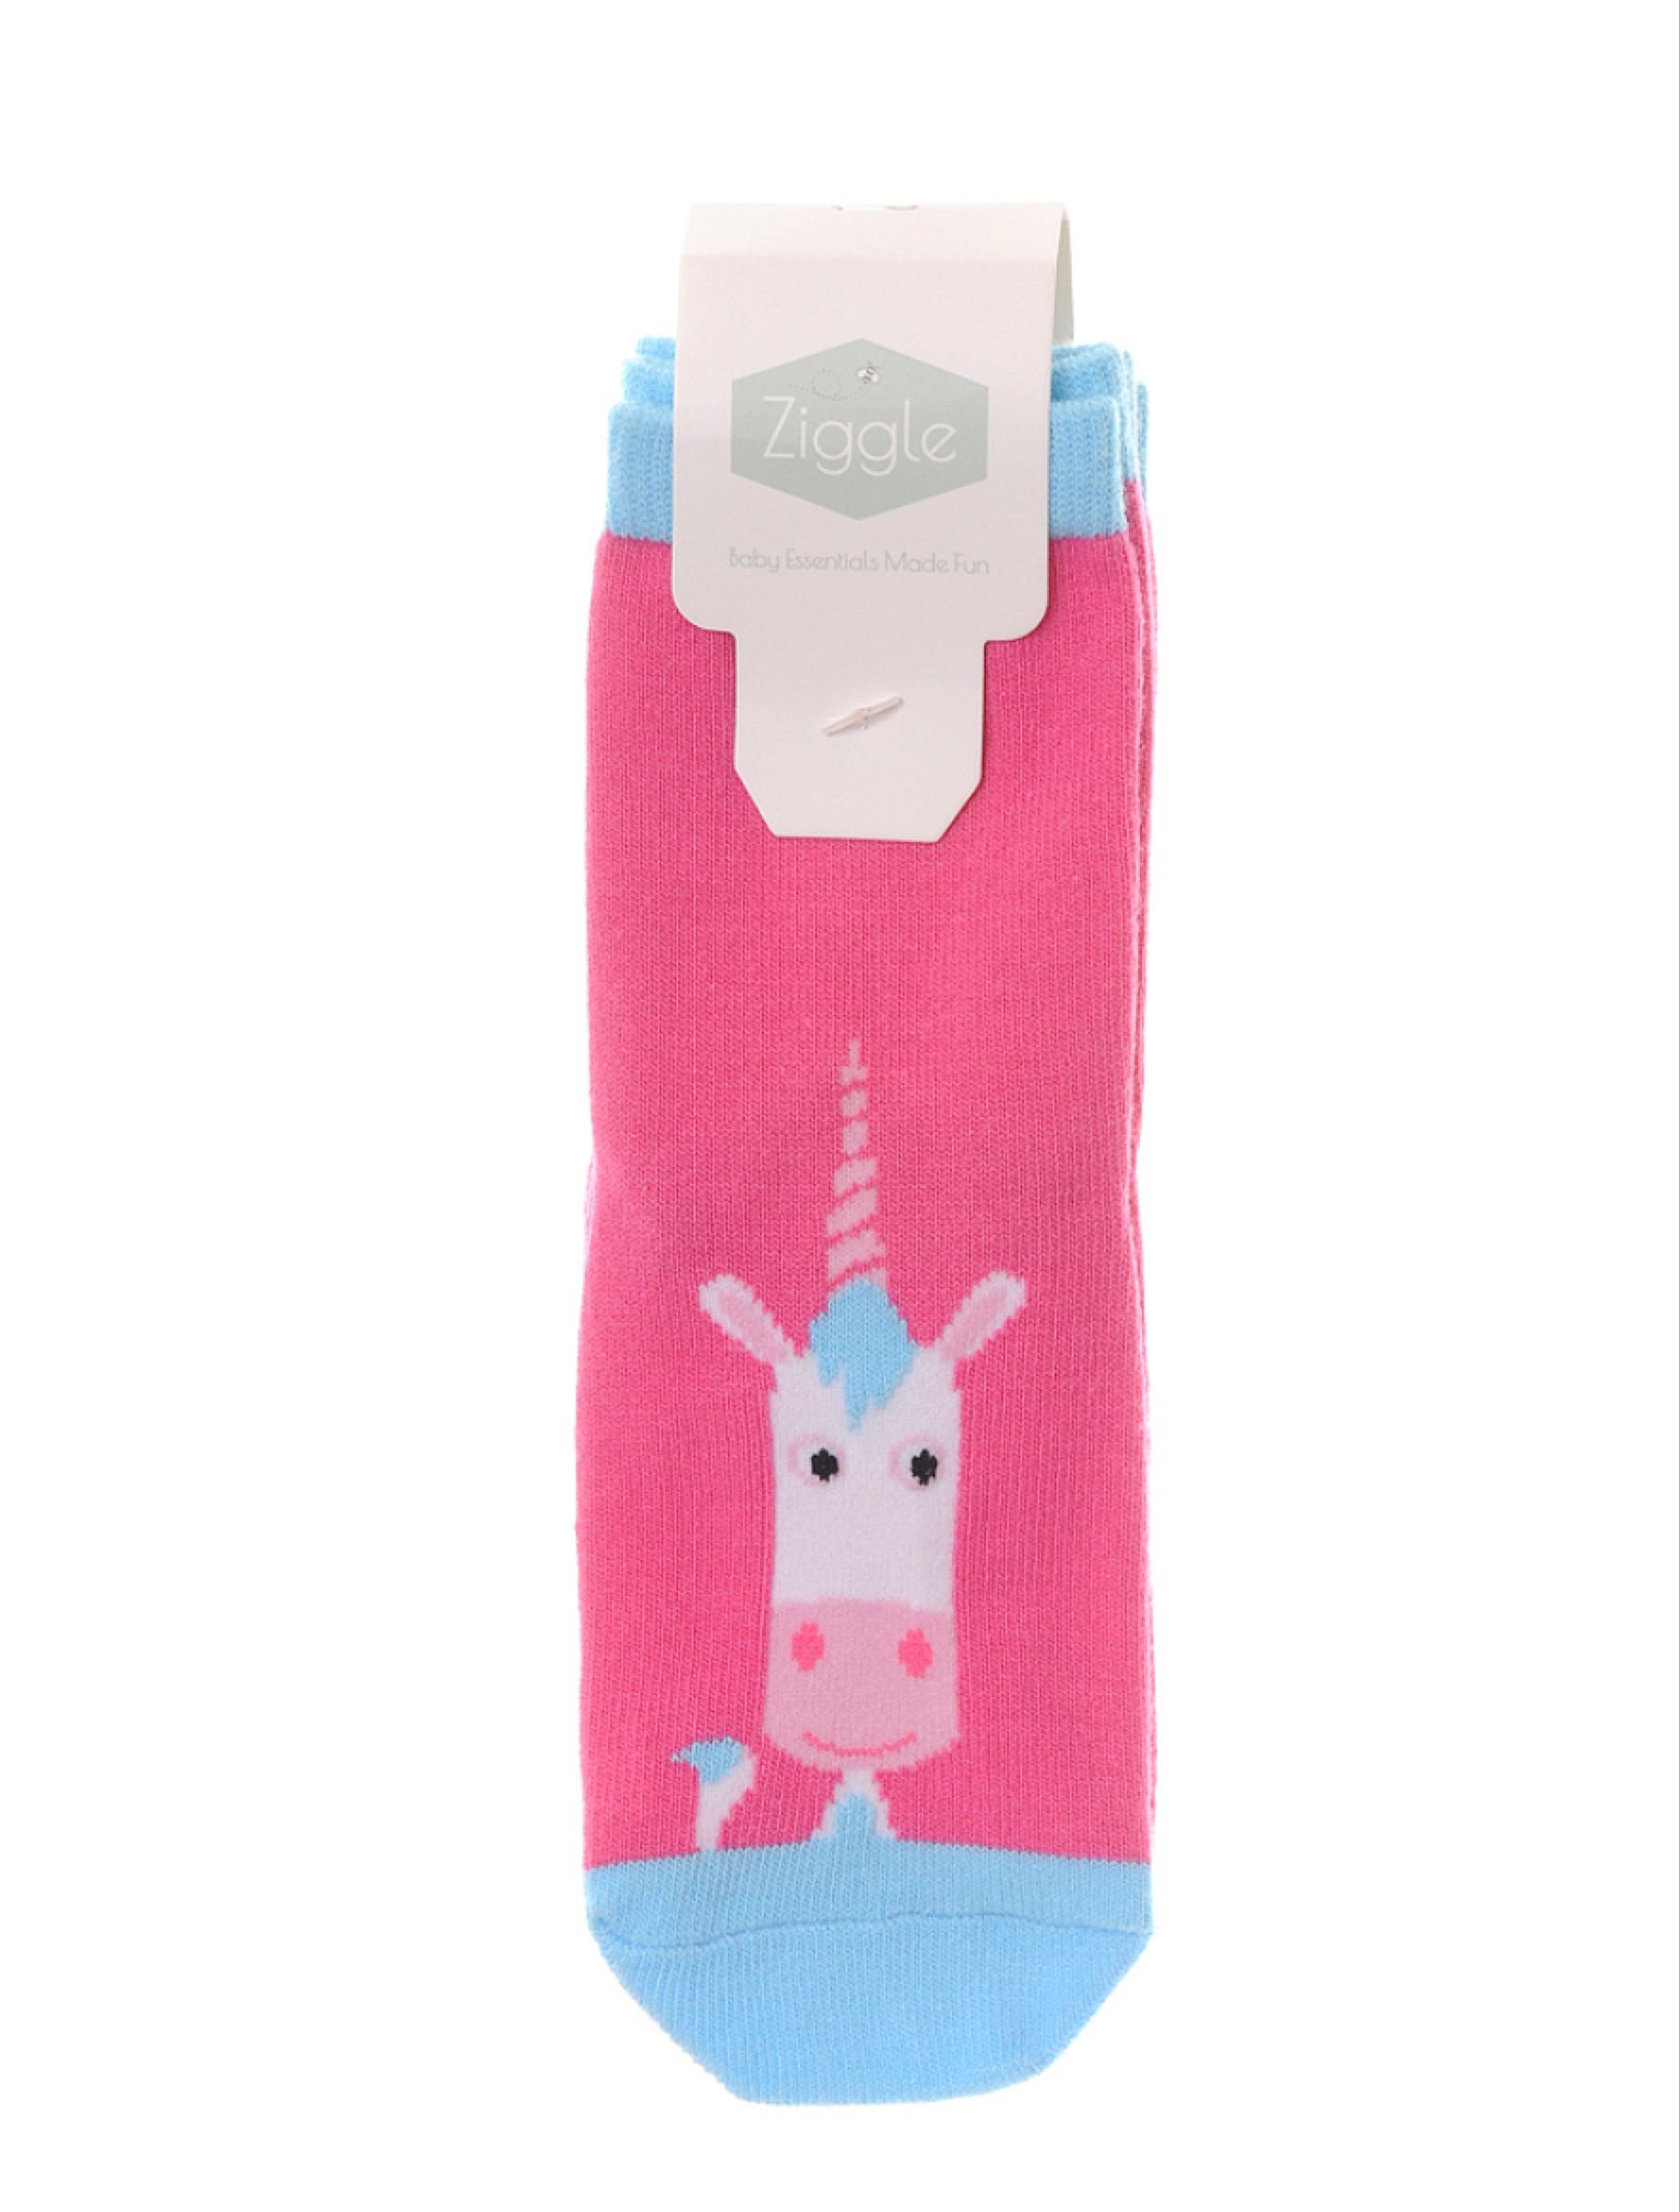 Ziggle Eunice Unicorn 2 pairs of Socks 18-24 months